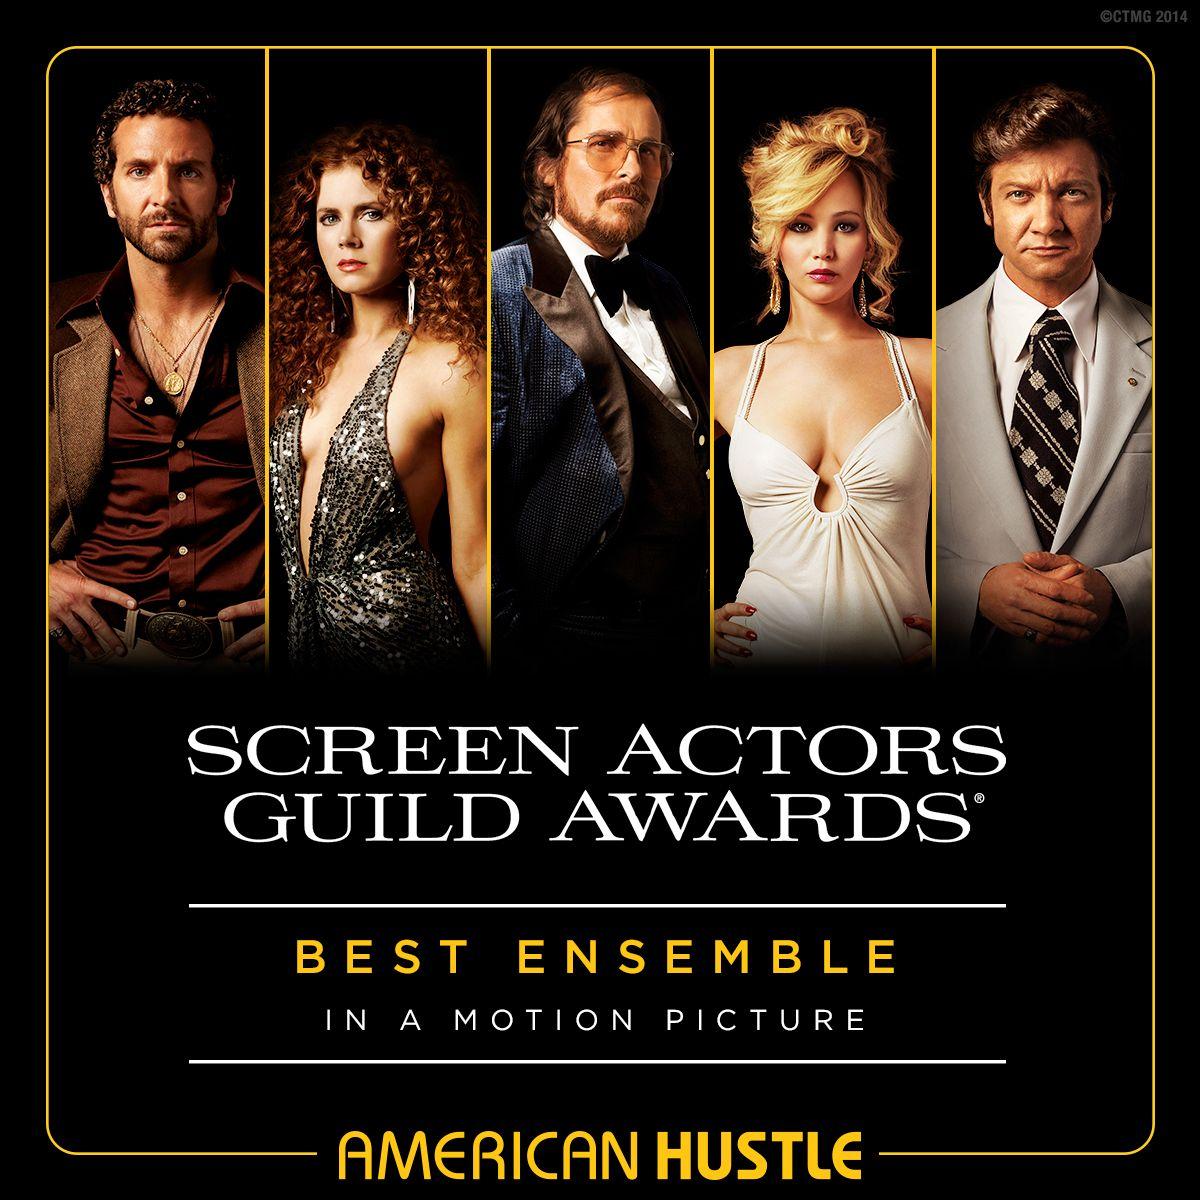 Screen Actors Guild Awards: American Hustle's cast wins ... |Motion Actors Guild